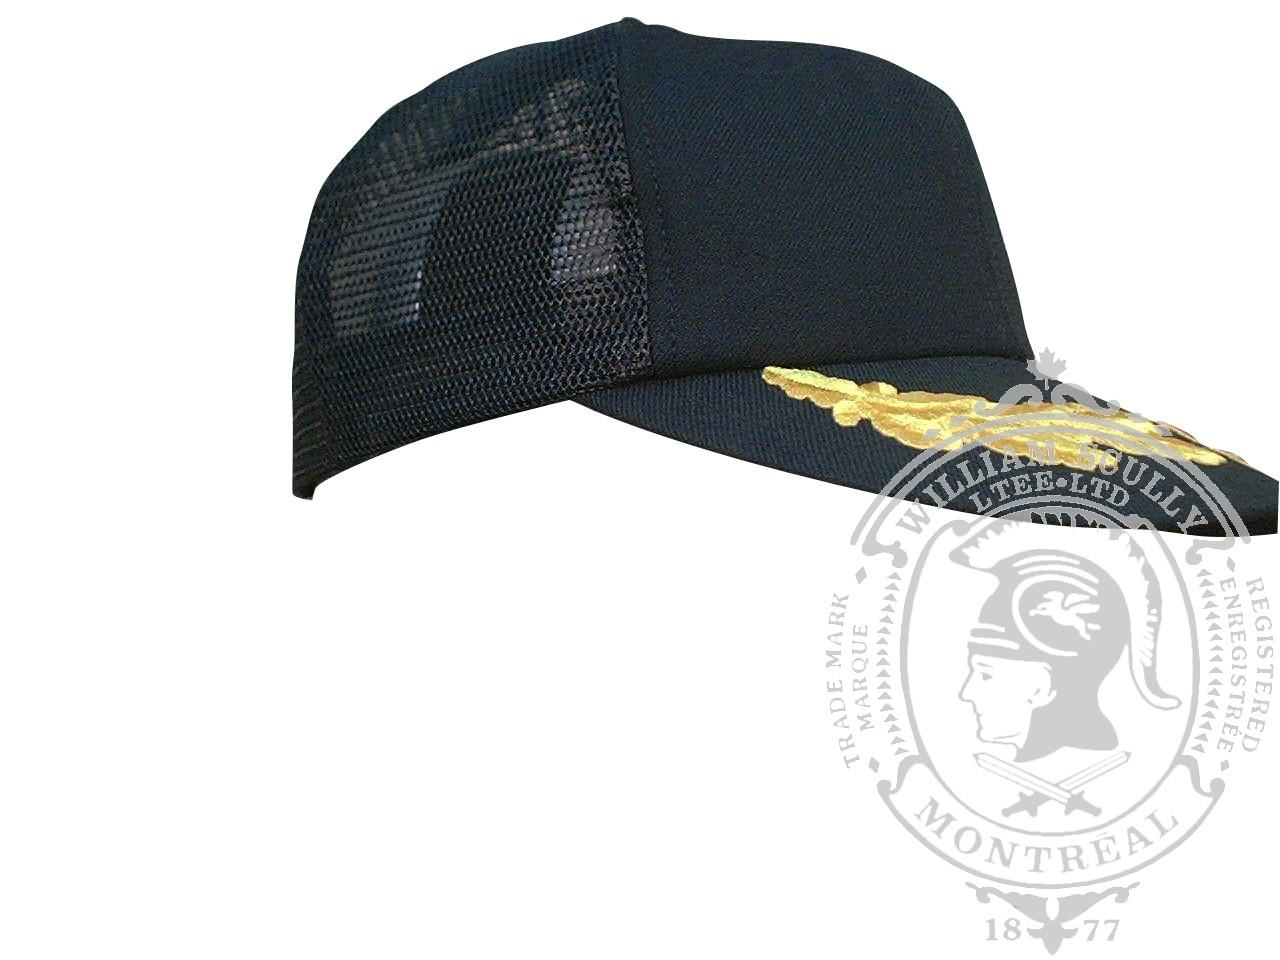 3-2002 S.W.A.T.T. Style Mesh Cap